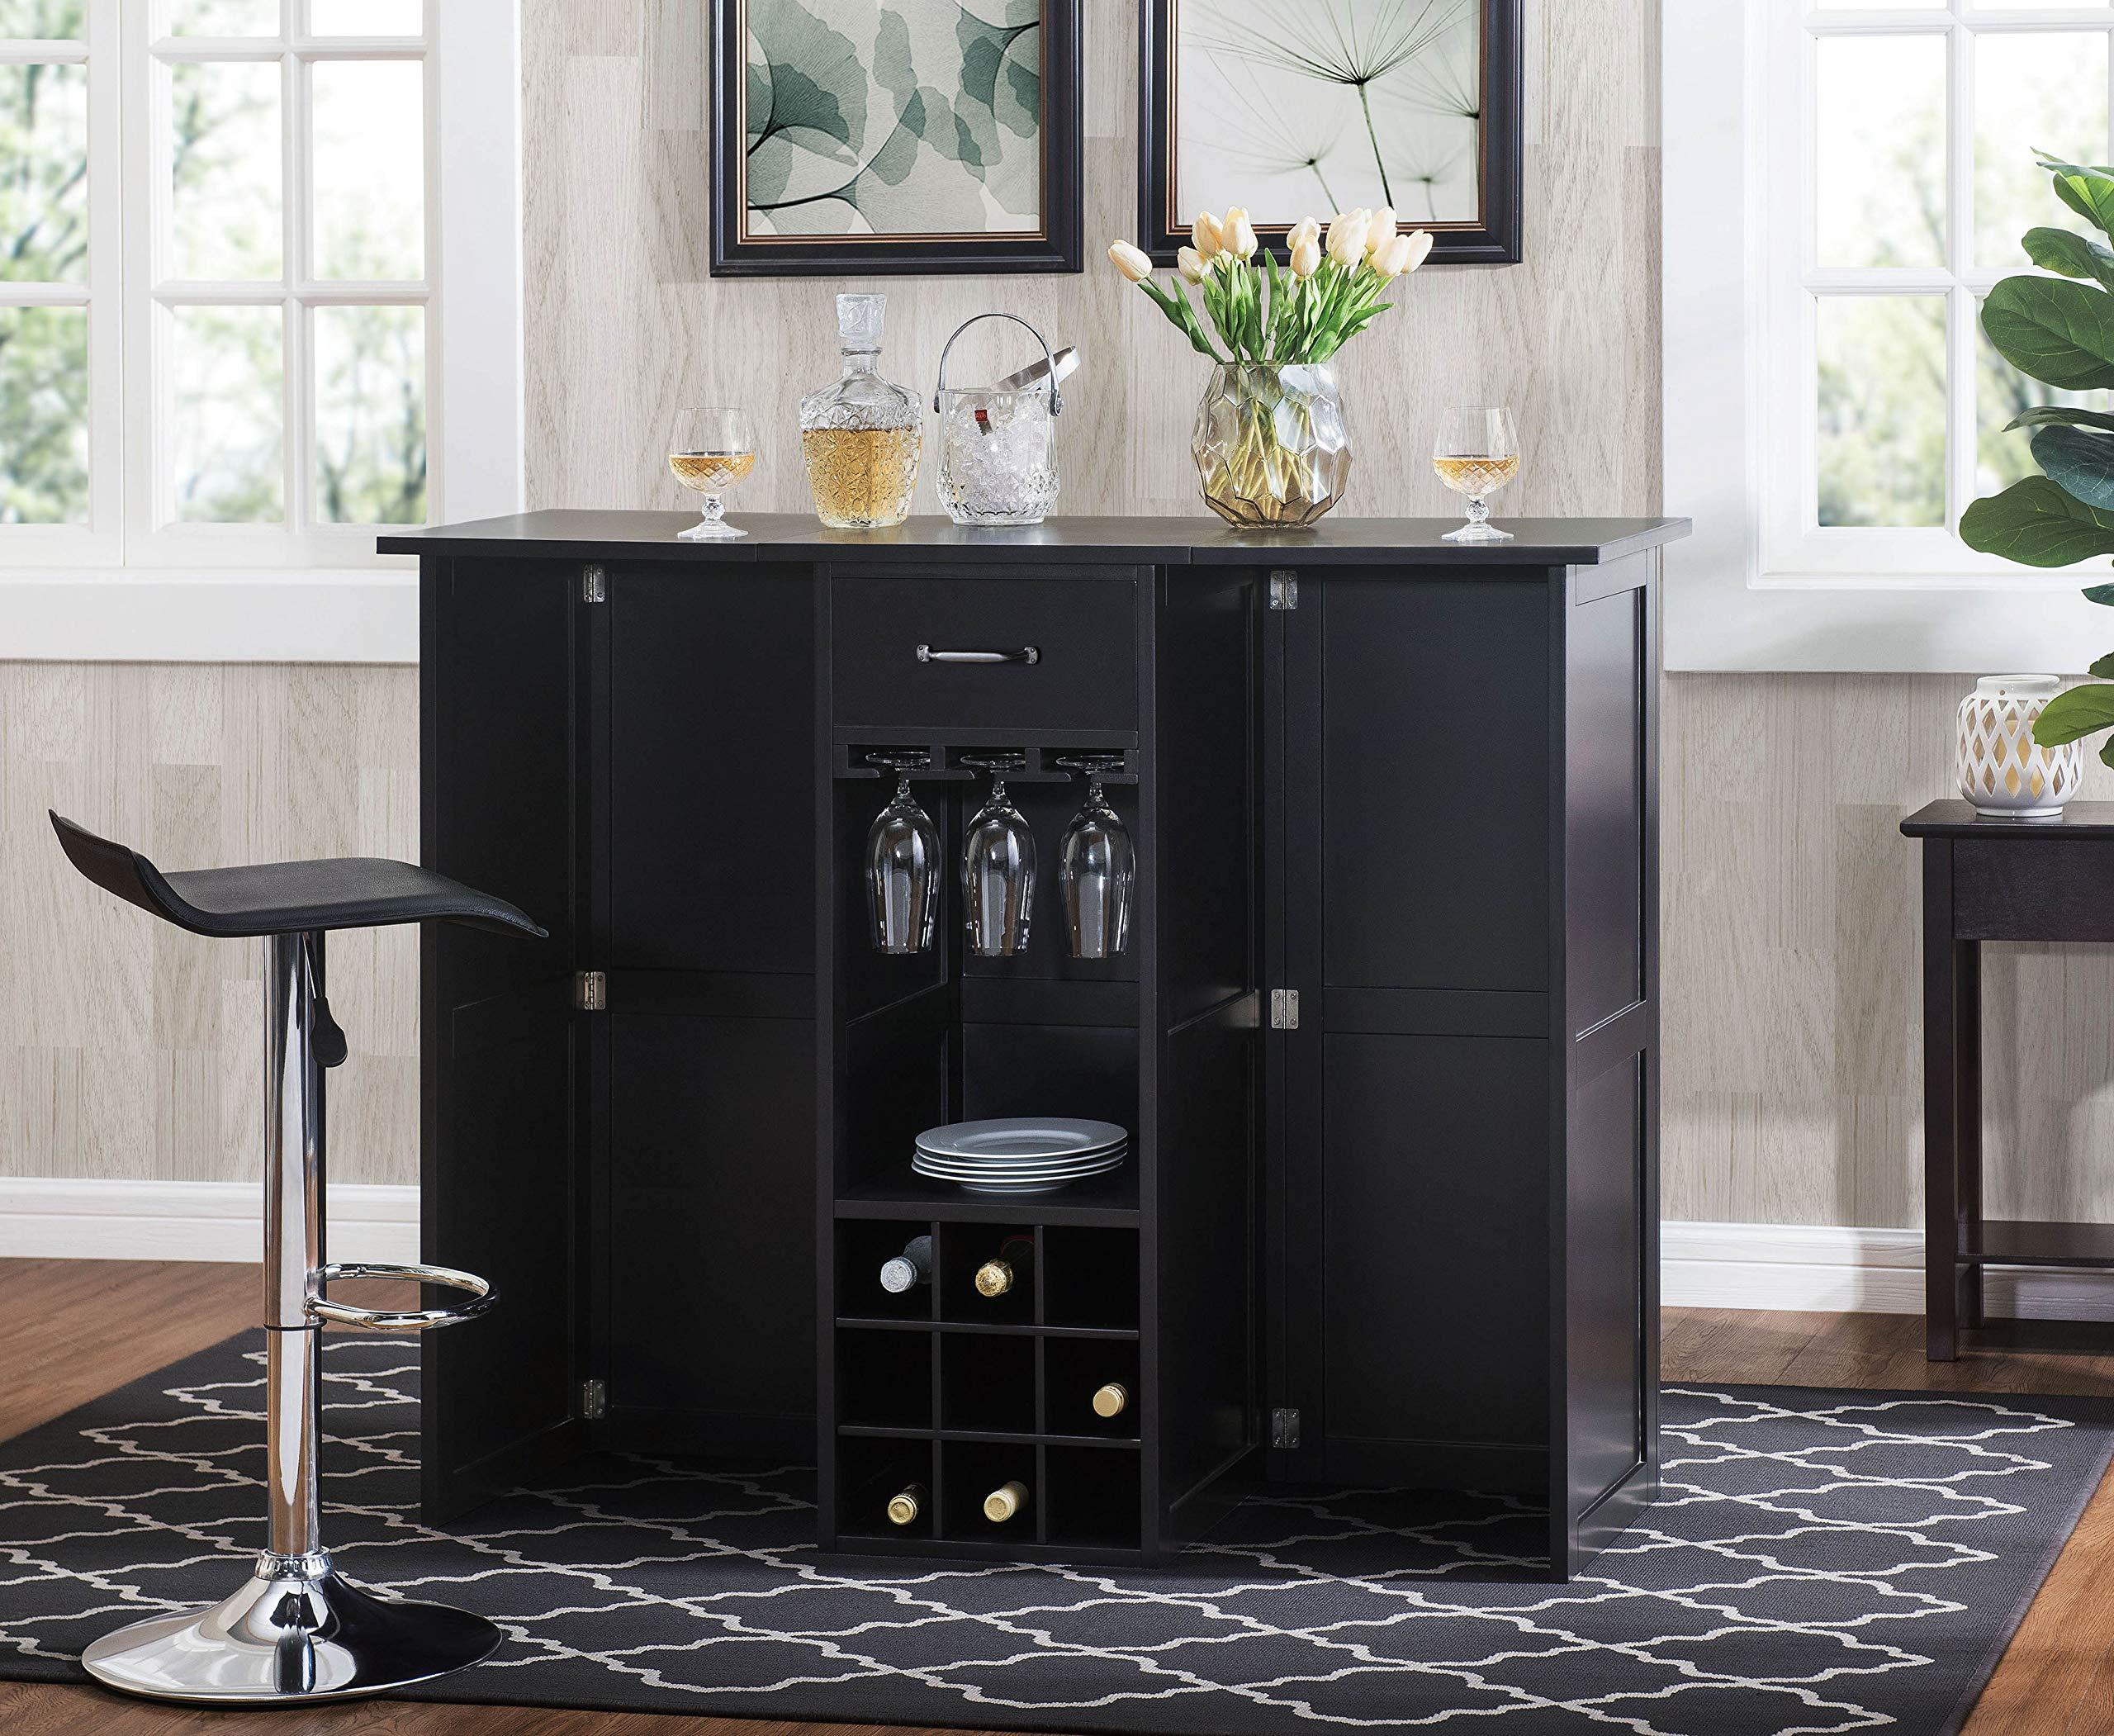 2L Lifestyle  Southwood Folding Wine Cabinet Bar,  Large,espresso by 2L Lifestyle